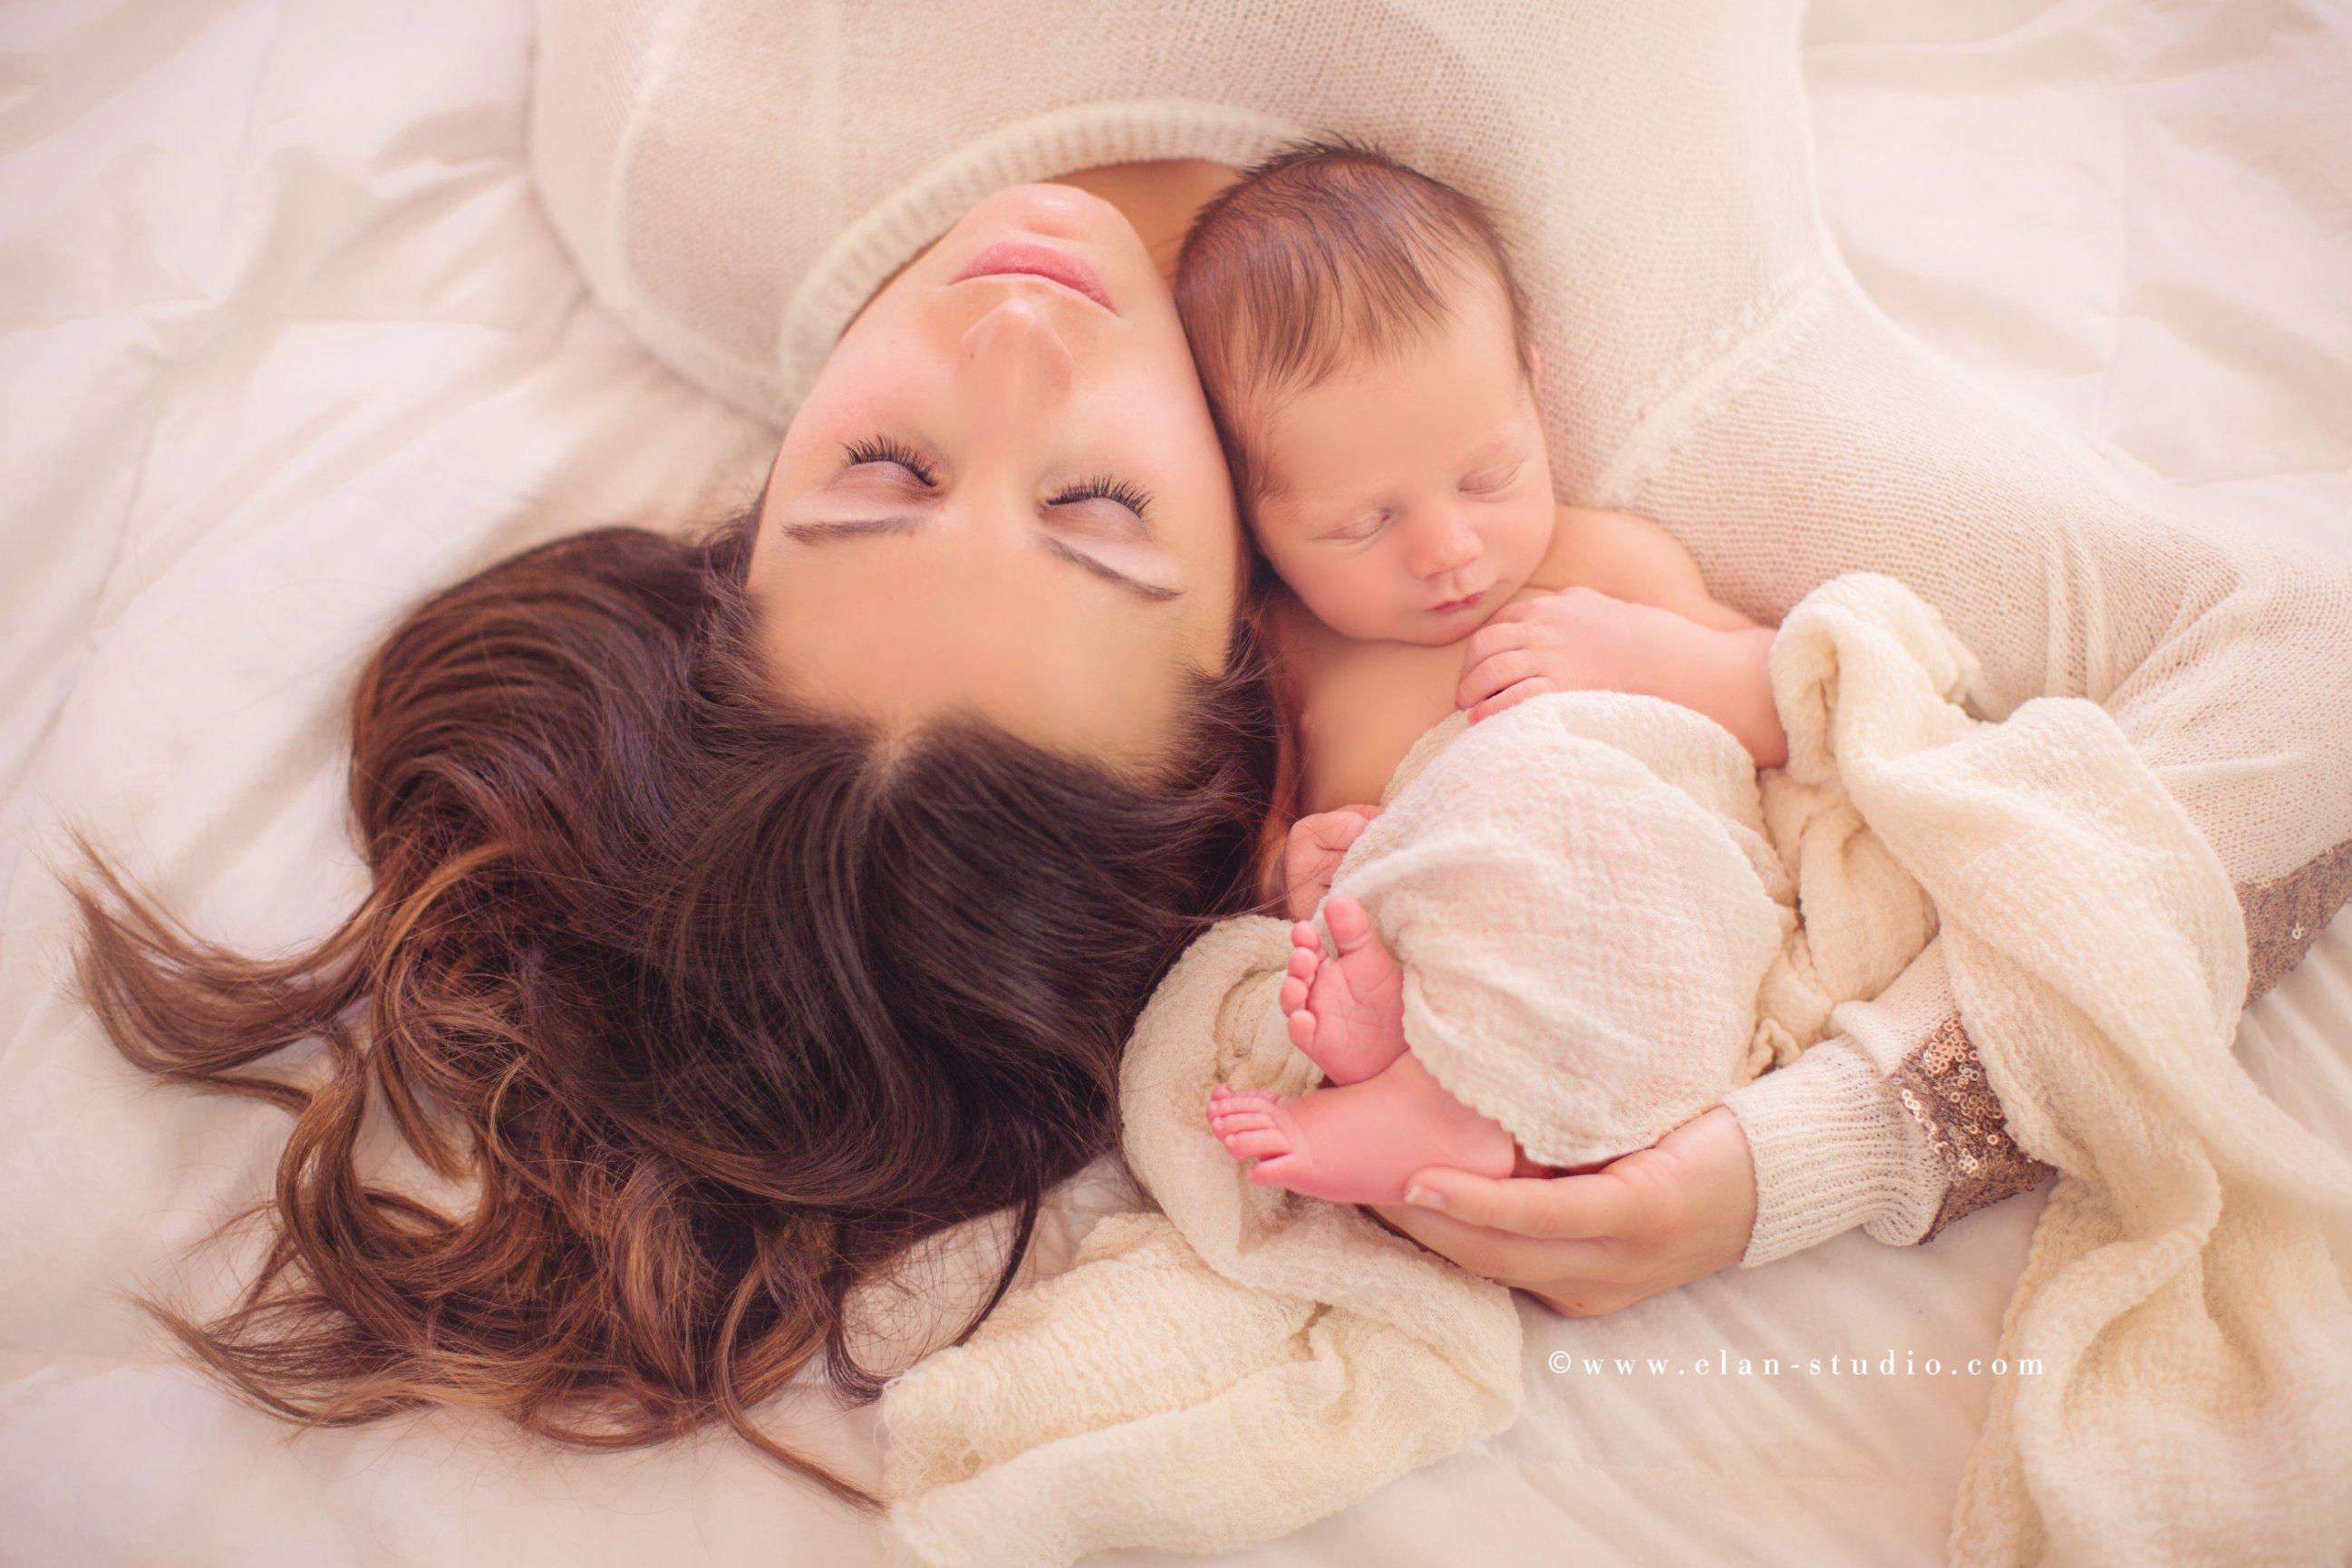 mother cradling newborn baby on a bed, creamy motherhood portrait edit, Elan Studio